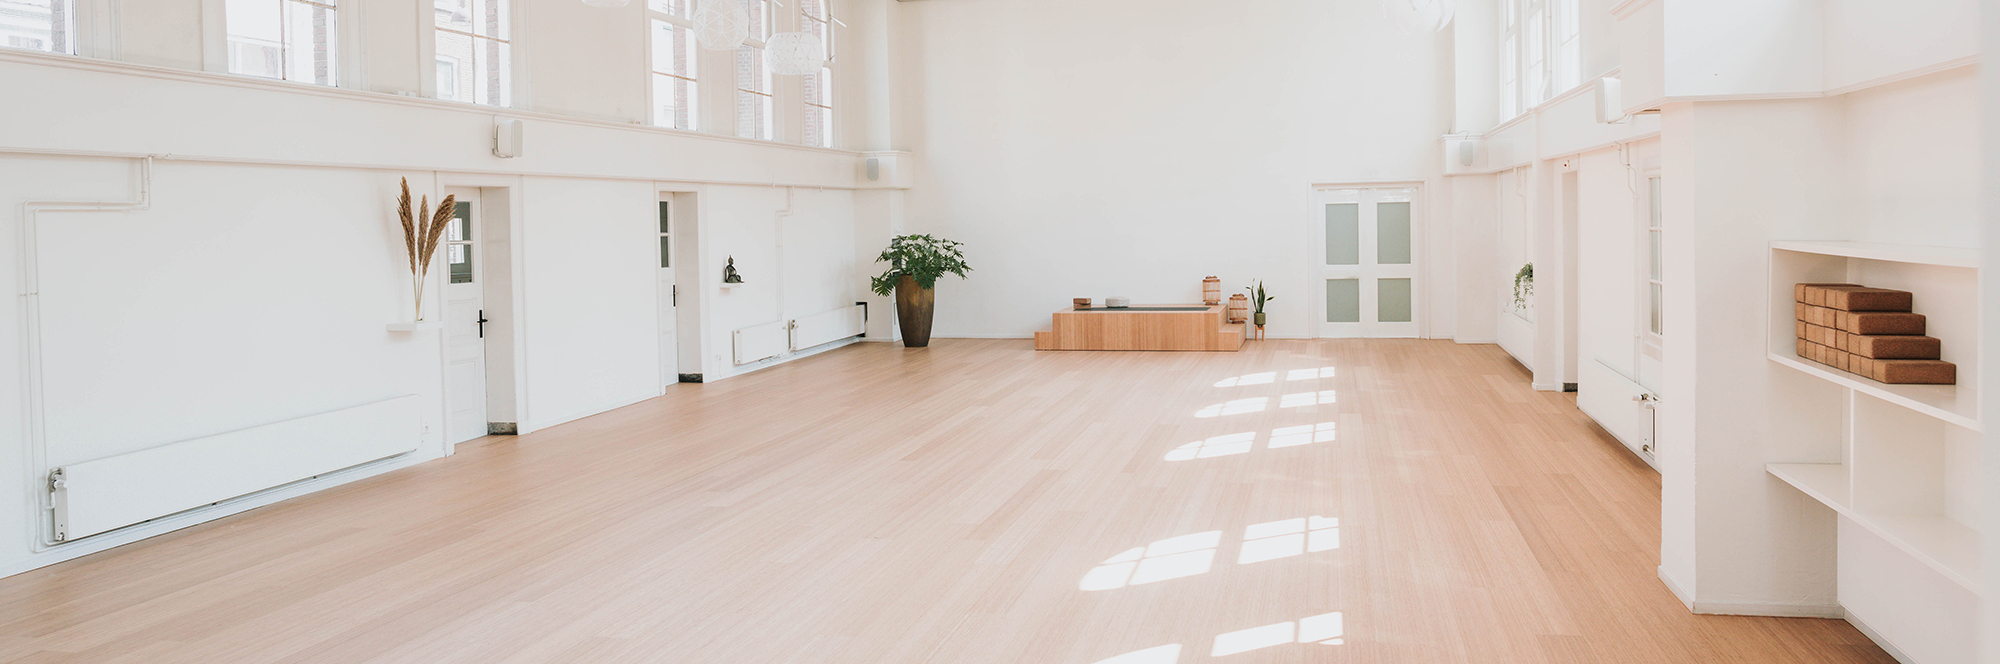 Yogaopleiding